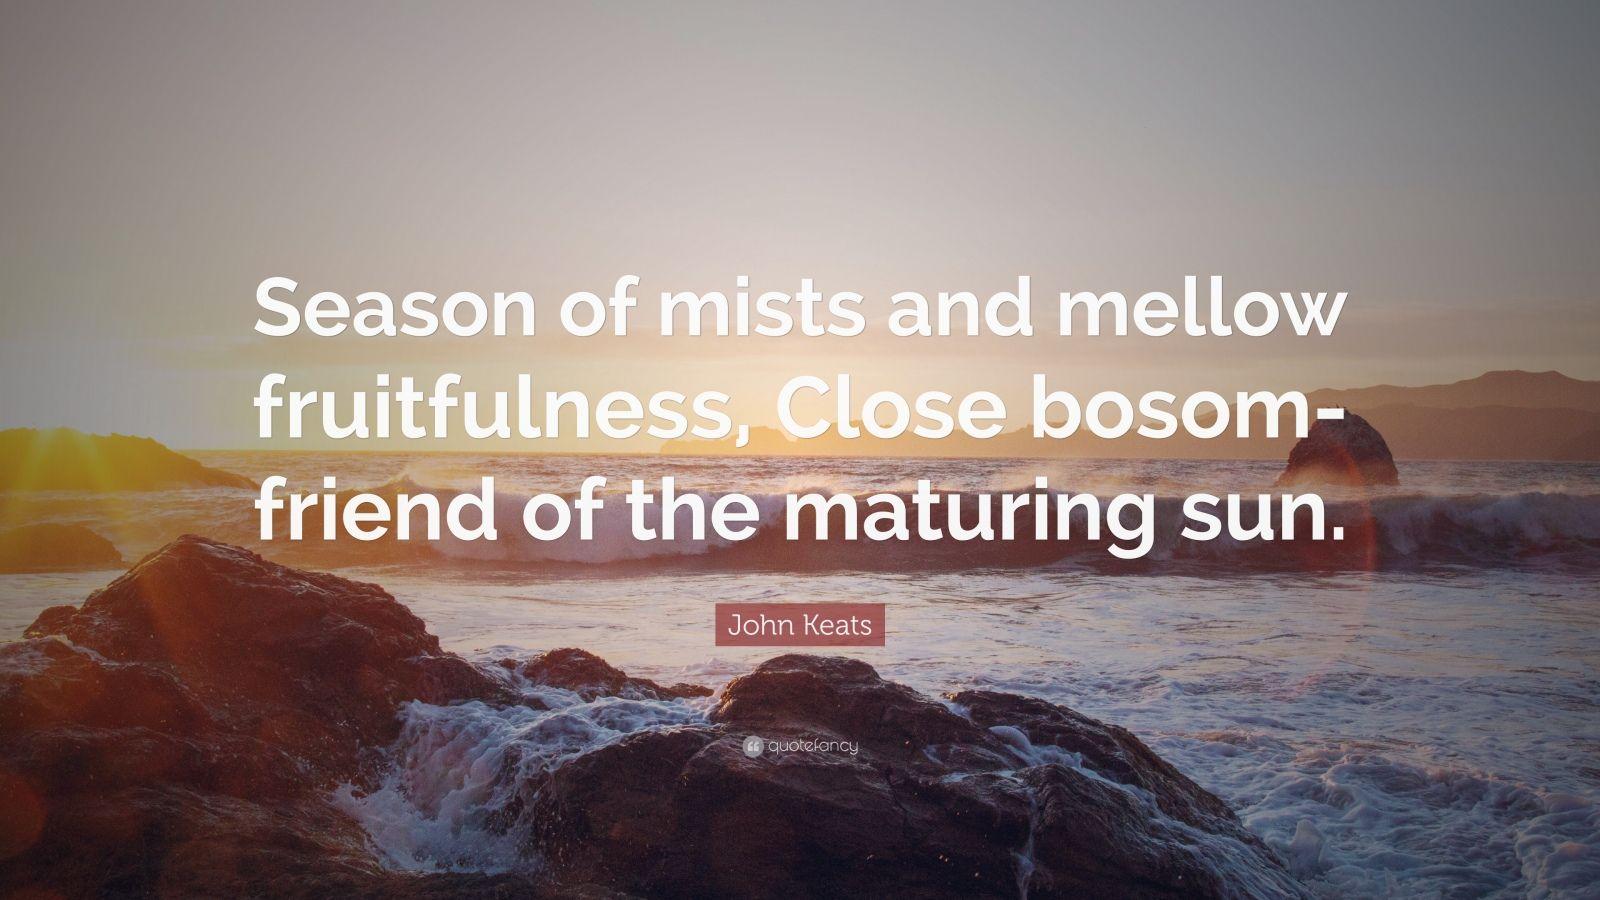 627. To Autumn. John Keats. The Oxford Book of English Verse